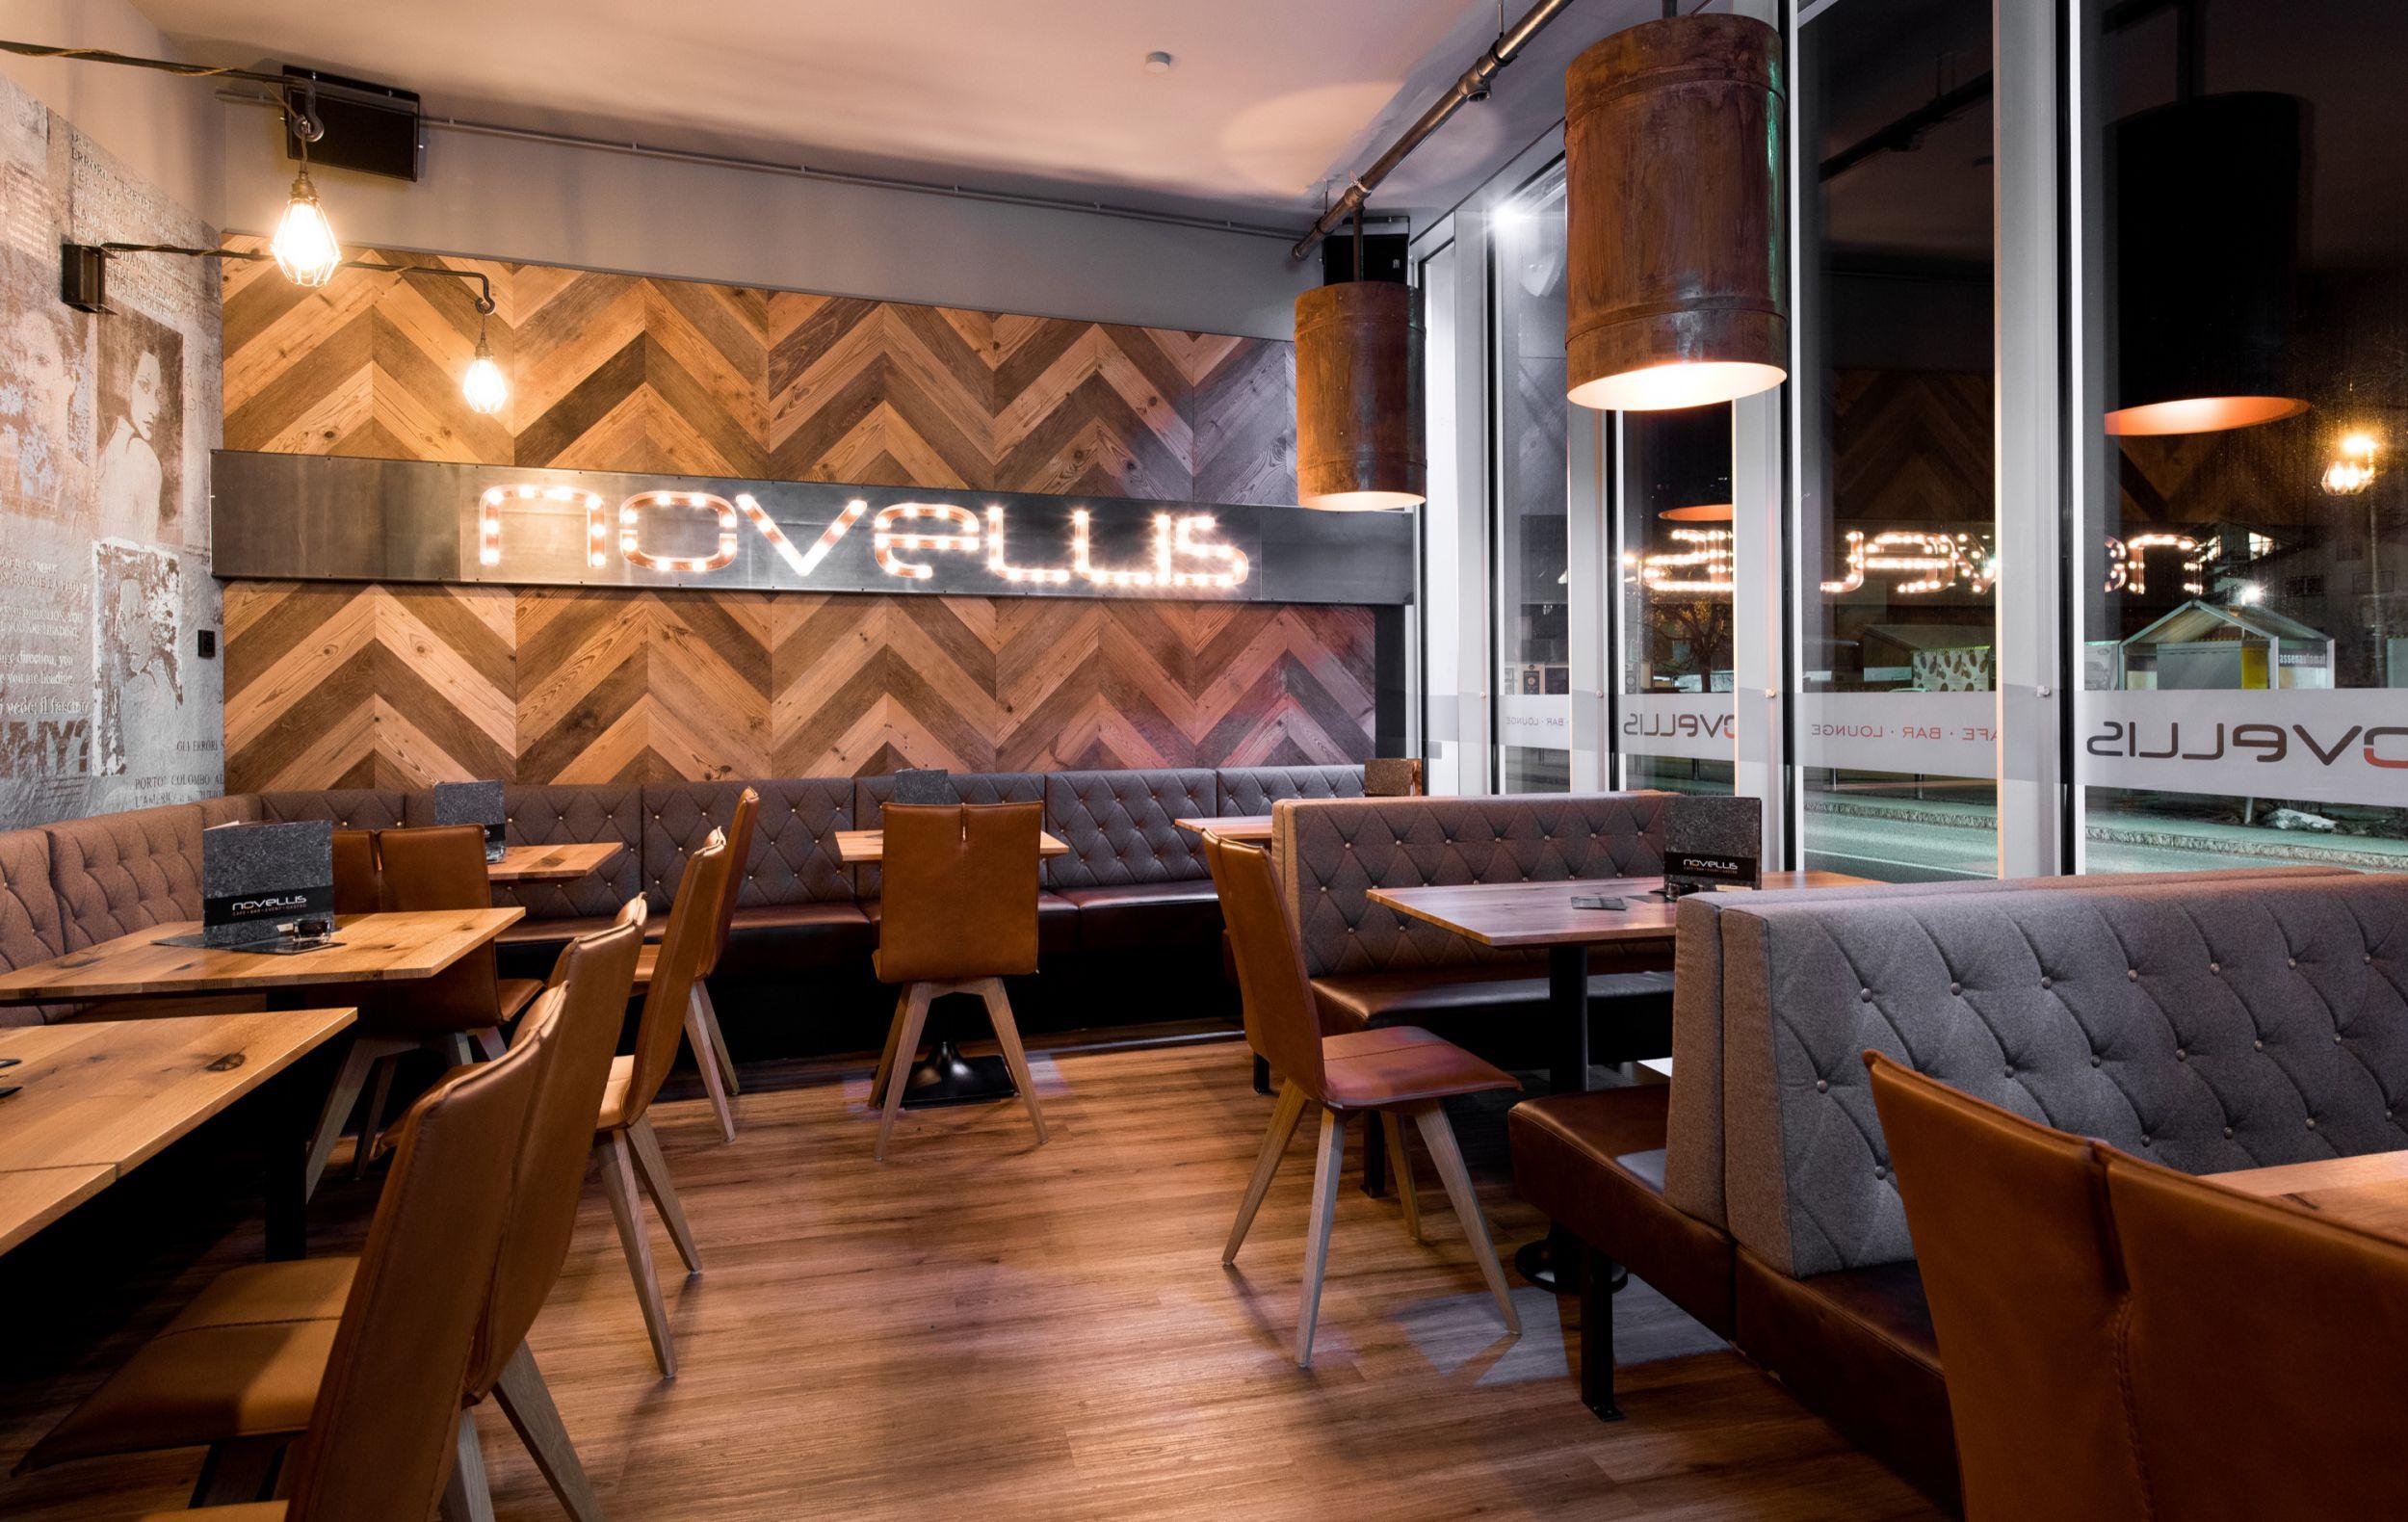 awesome cafe design entspannter atmosphare ideas house